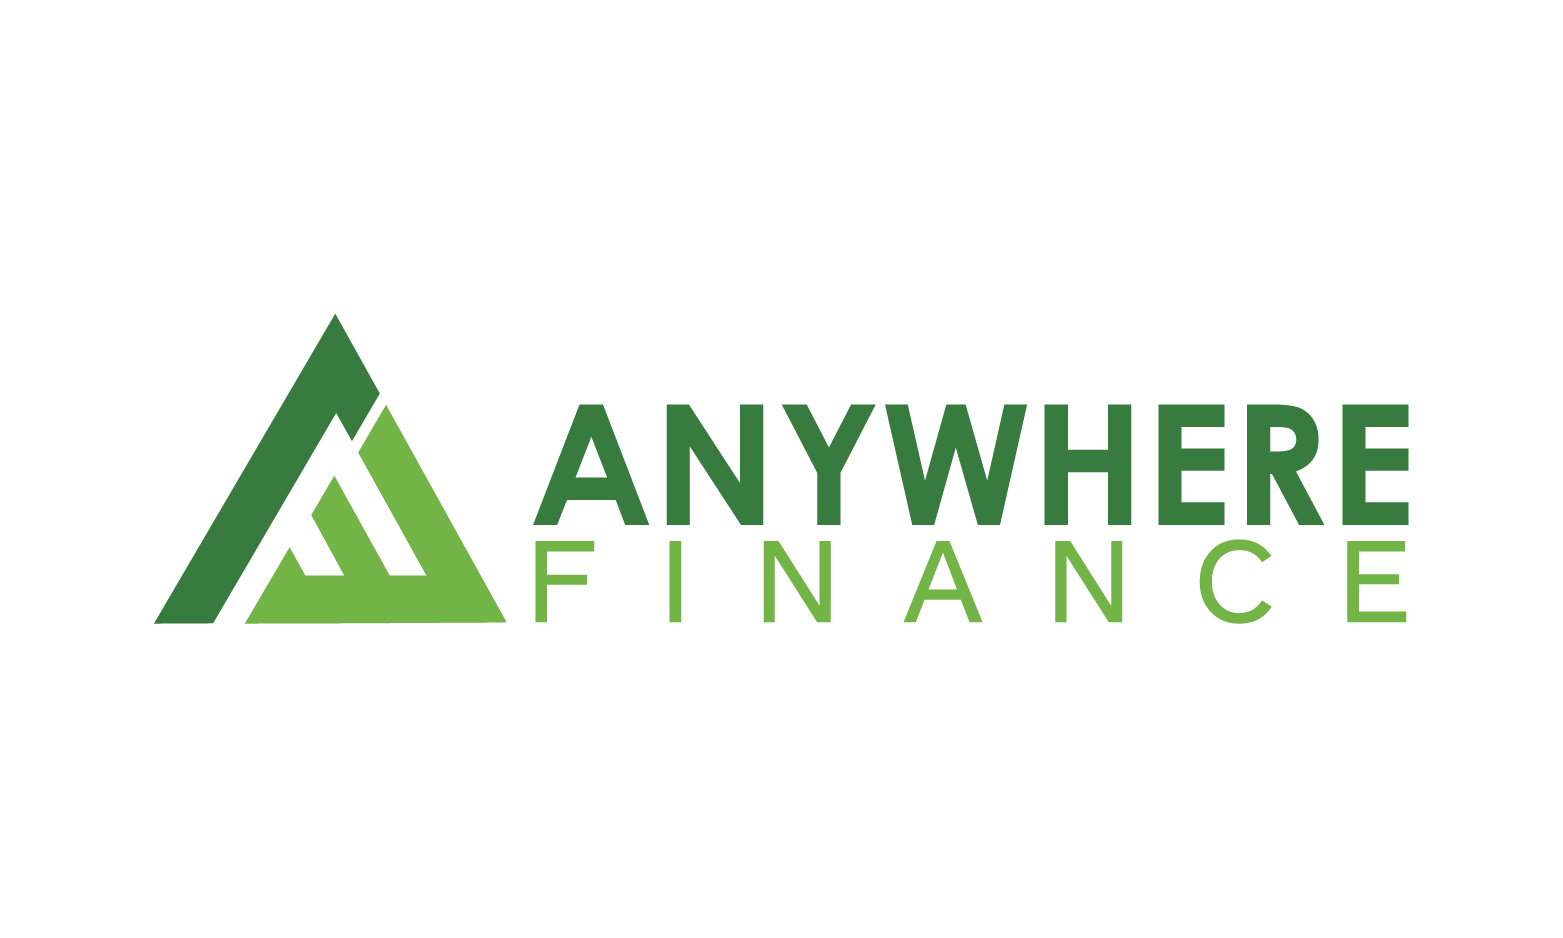 AnywhereFinance.com